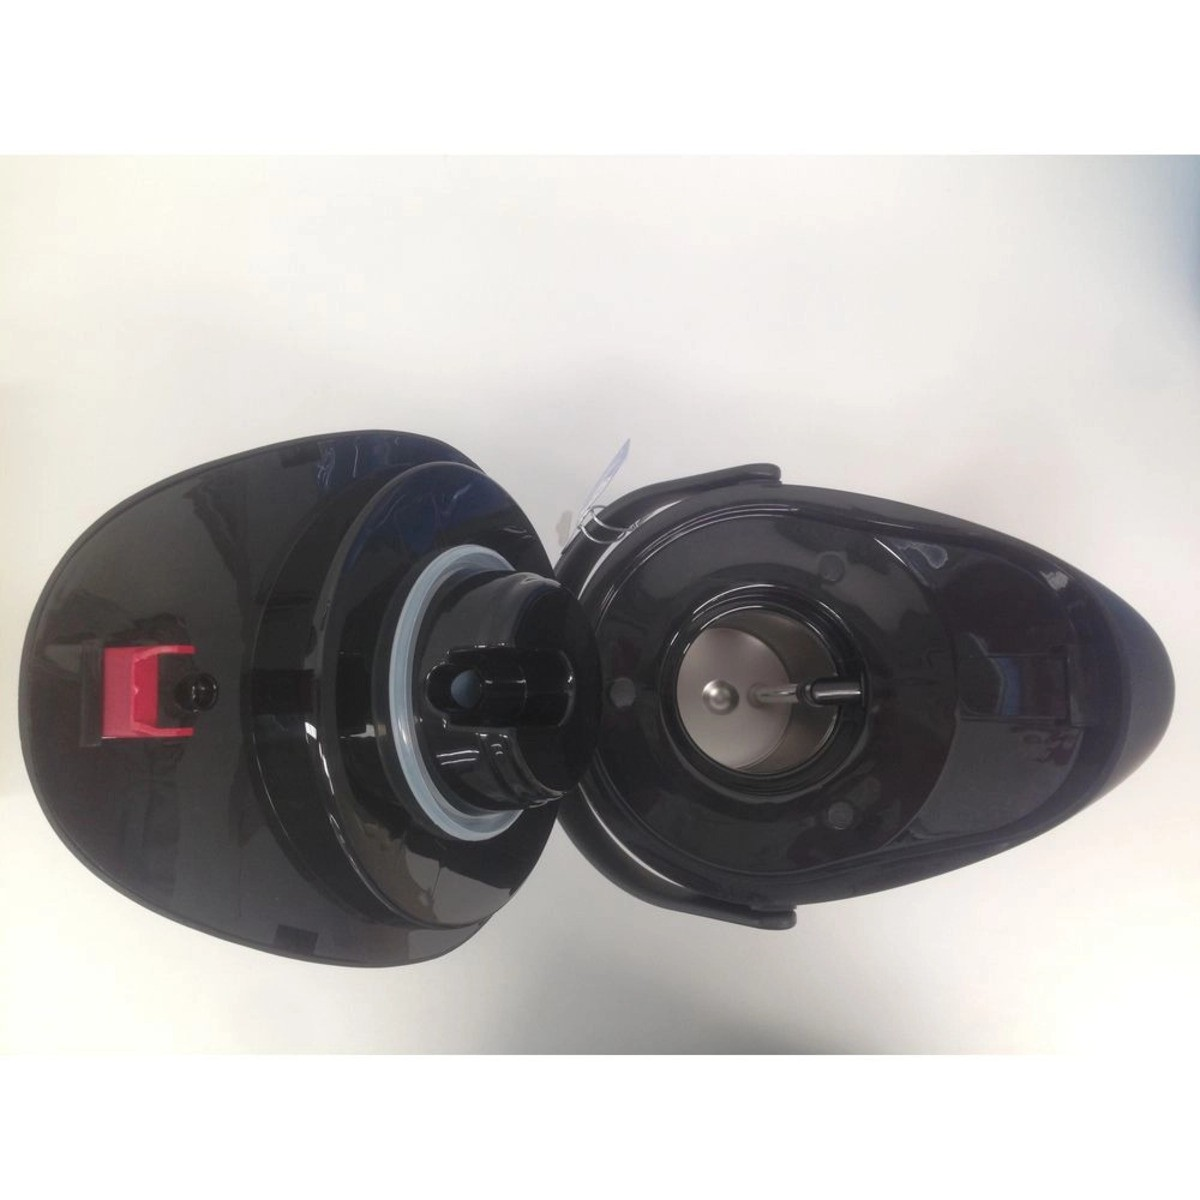 Garrafa Térmica Inox Quente e Frio 3L com Ampola de Inox A5